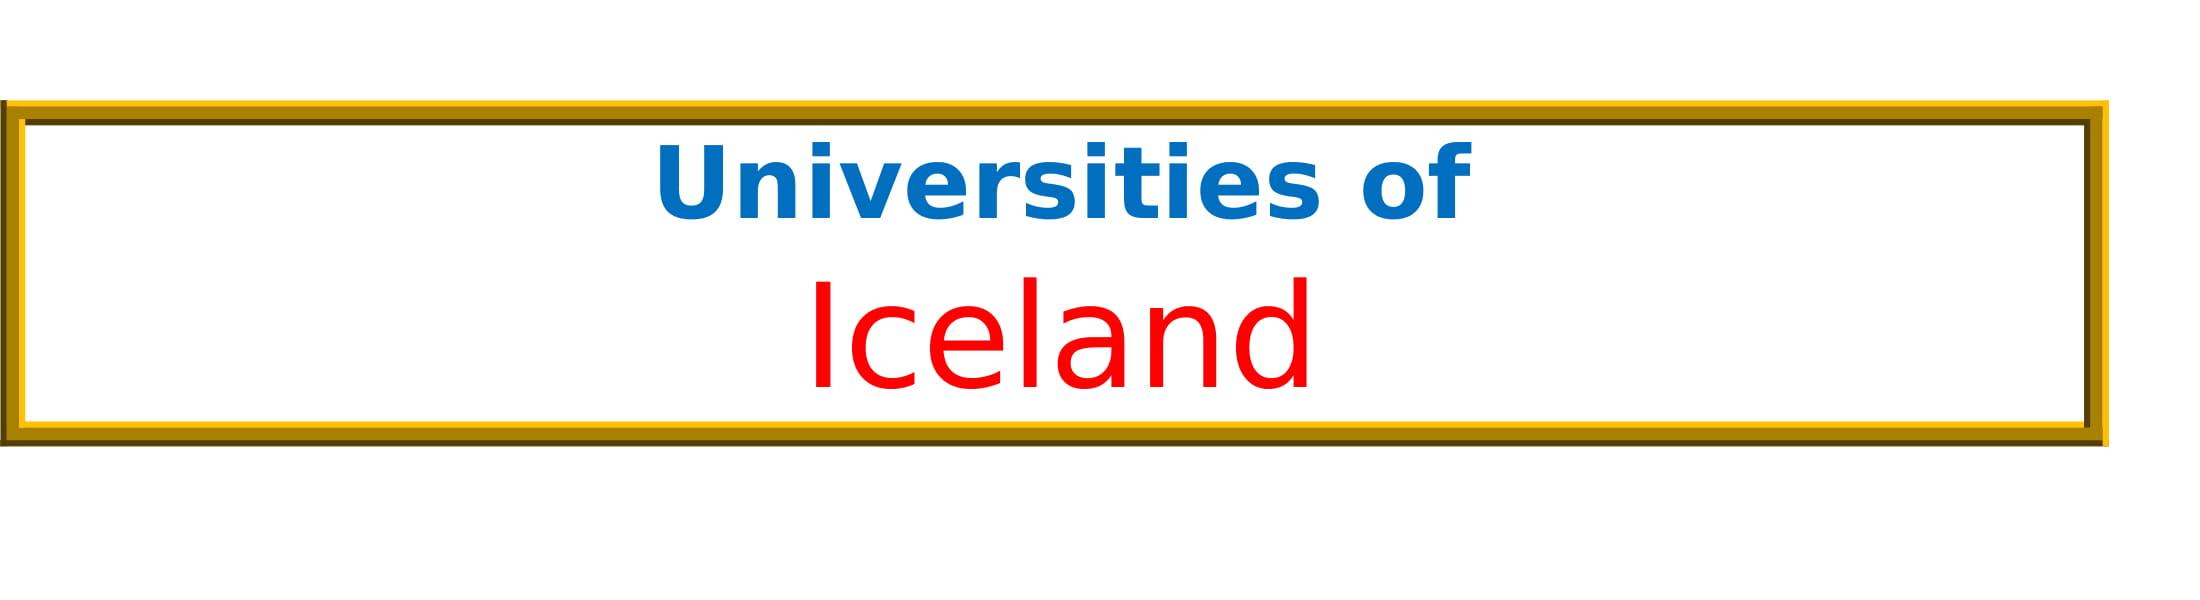 List of Universities in Iceland